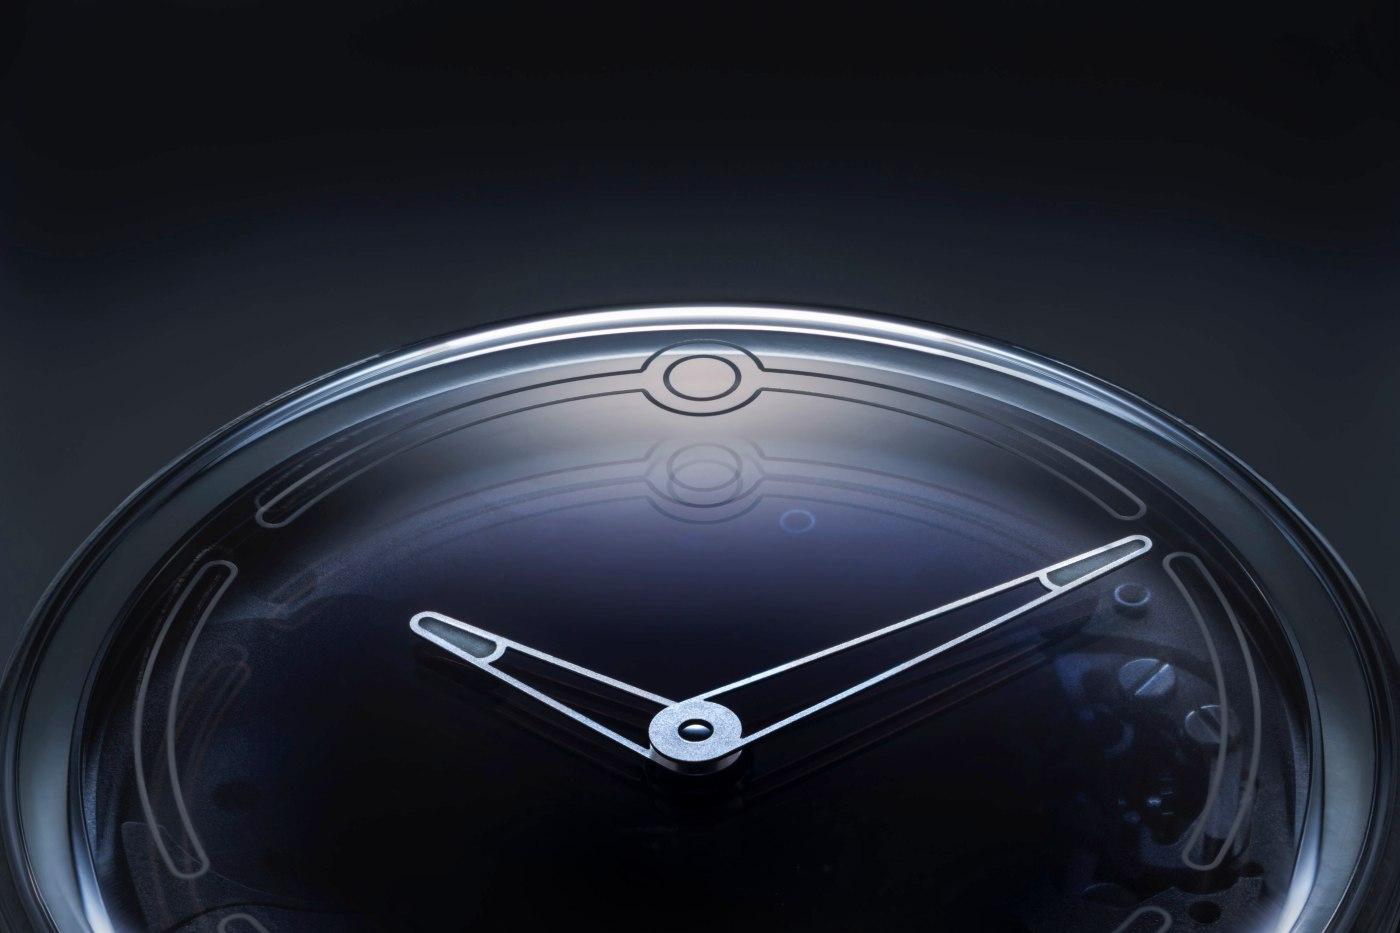 Ming 19.01 watch close-up